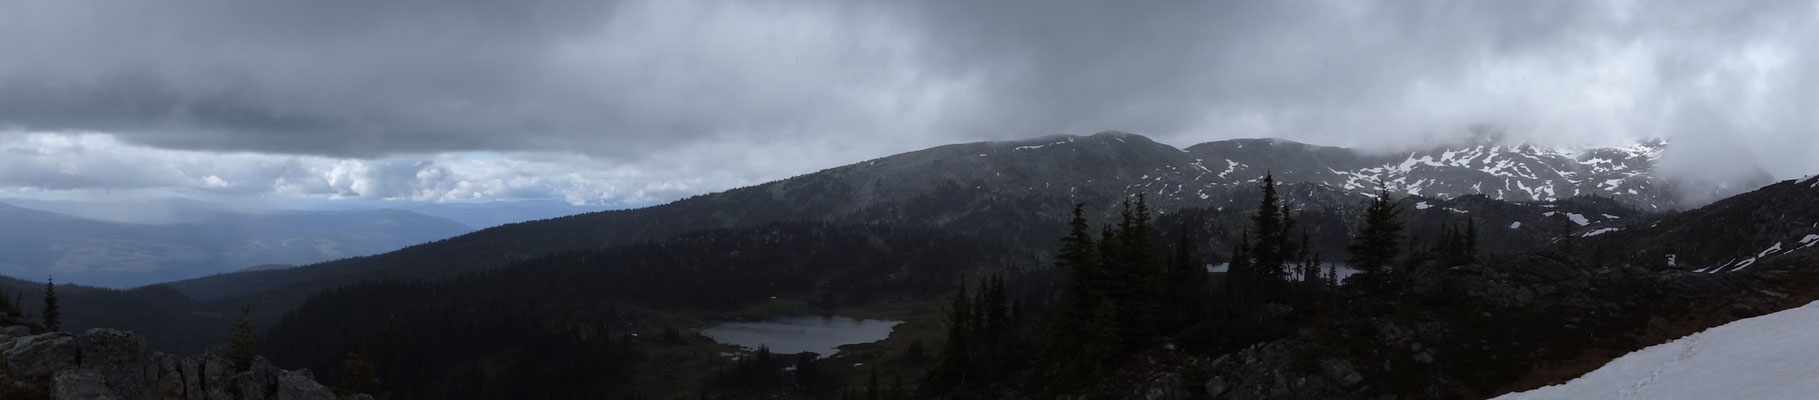 Verregneter Blick auf den Sheila Lake